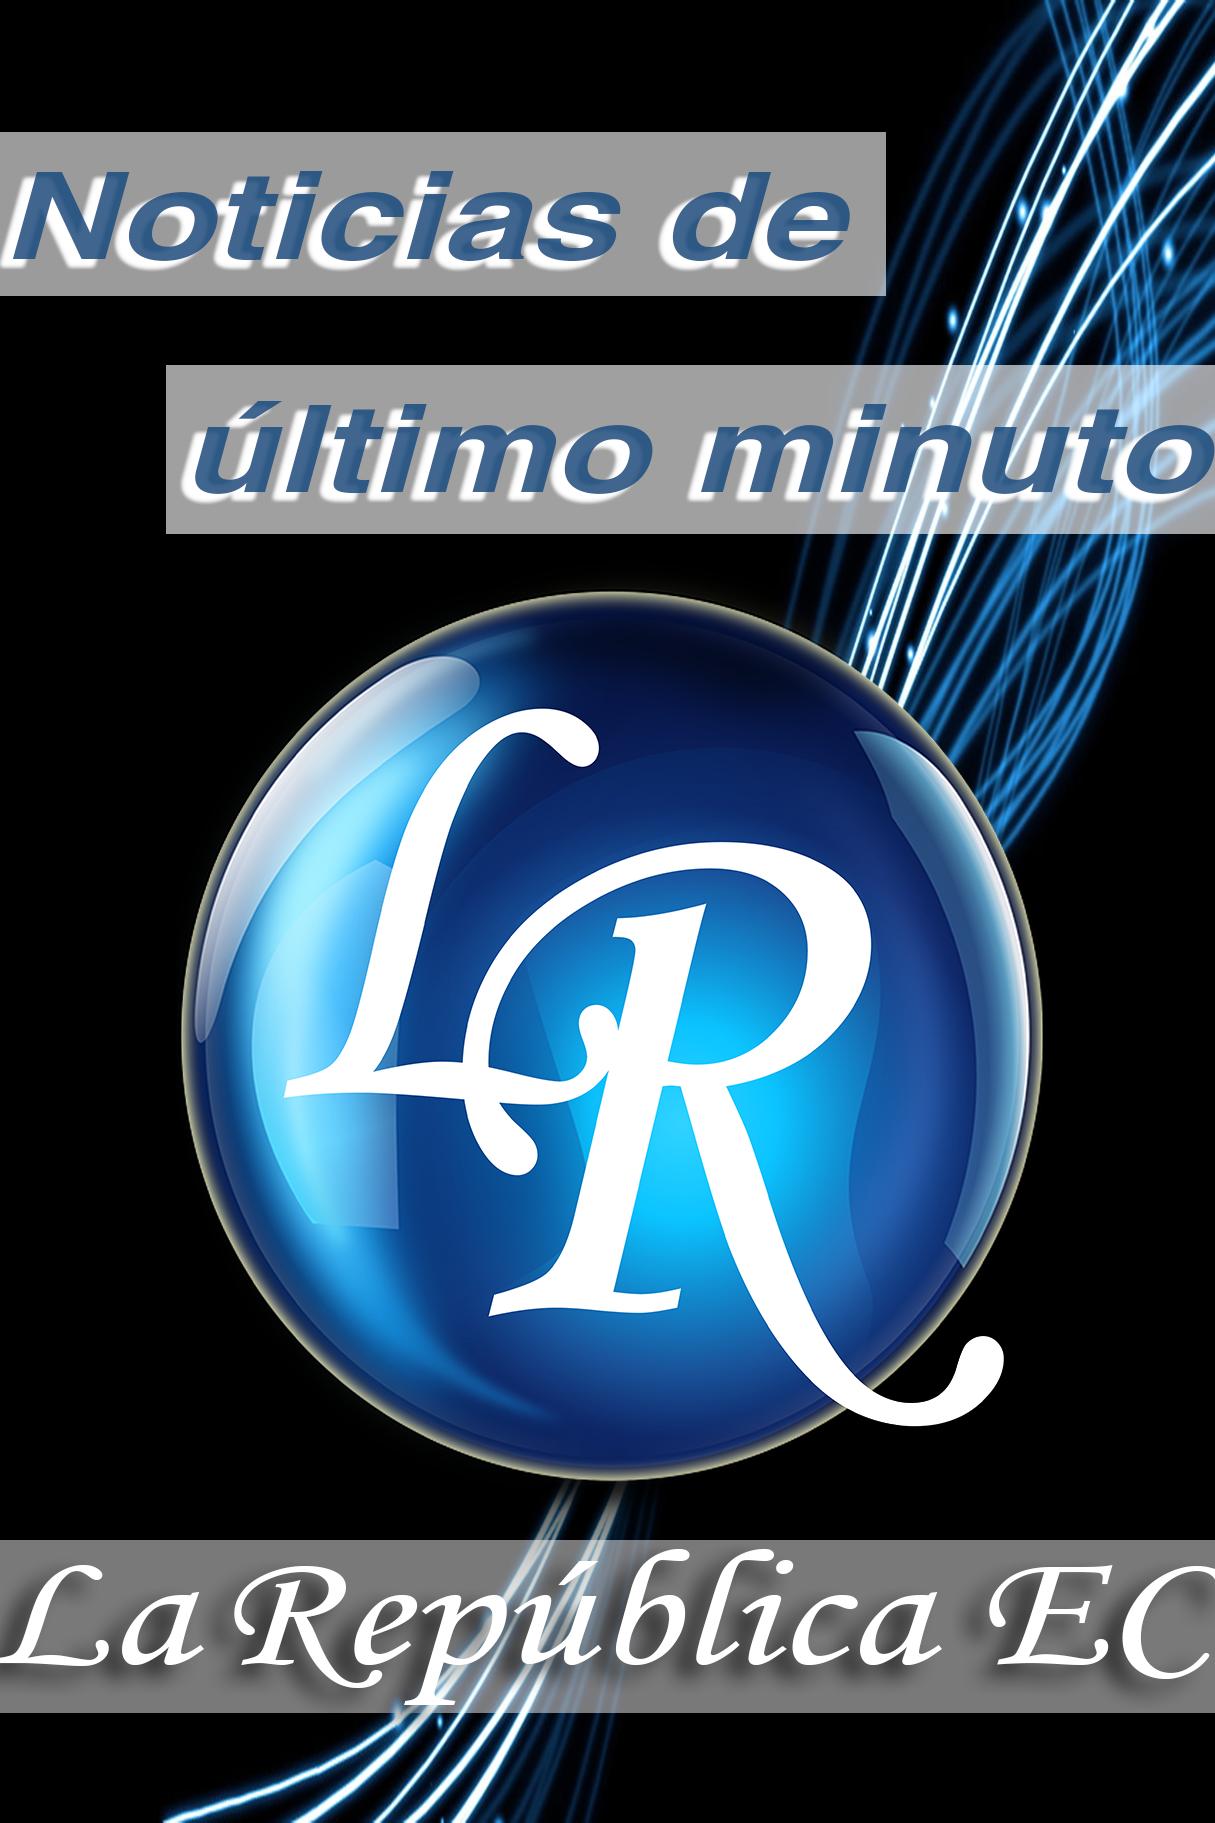 Noticias de ltimo minuto on livestream Noticias de ultimo momento espectaculos